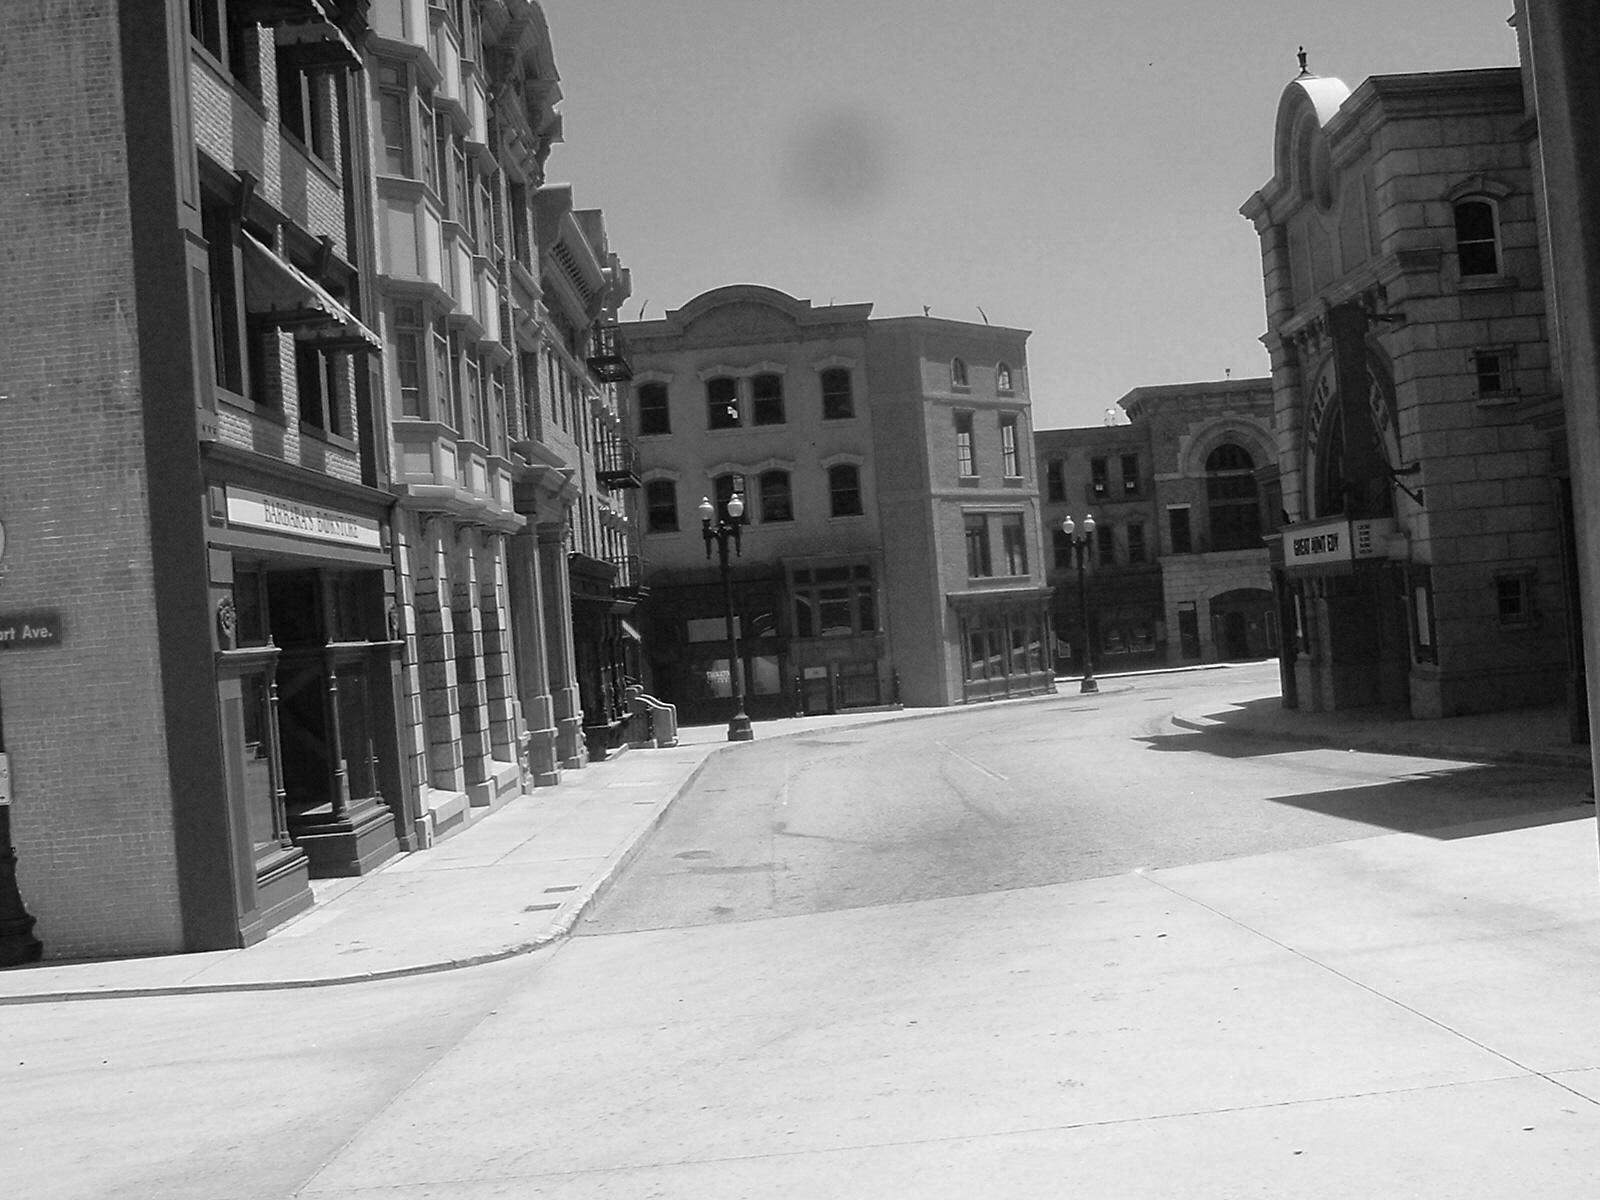 Universal Studios set by sSTARRMa